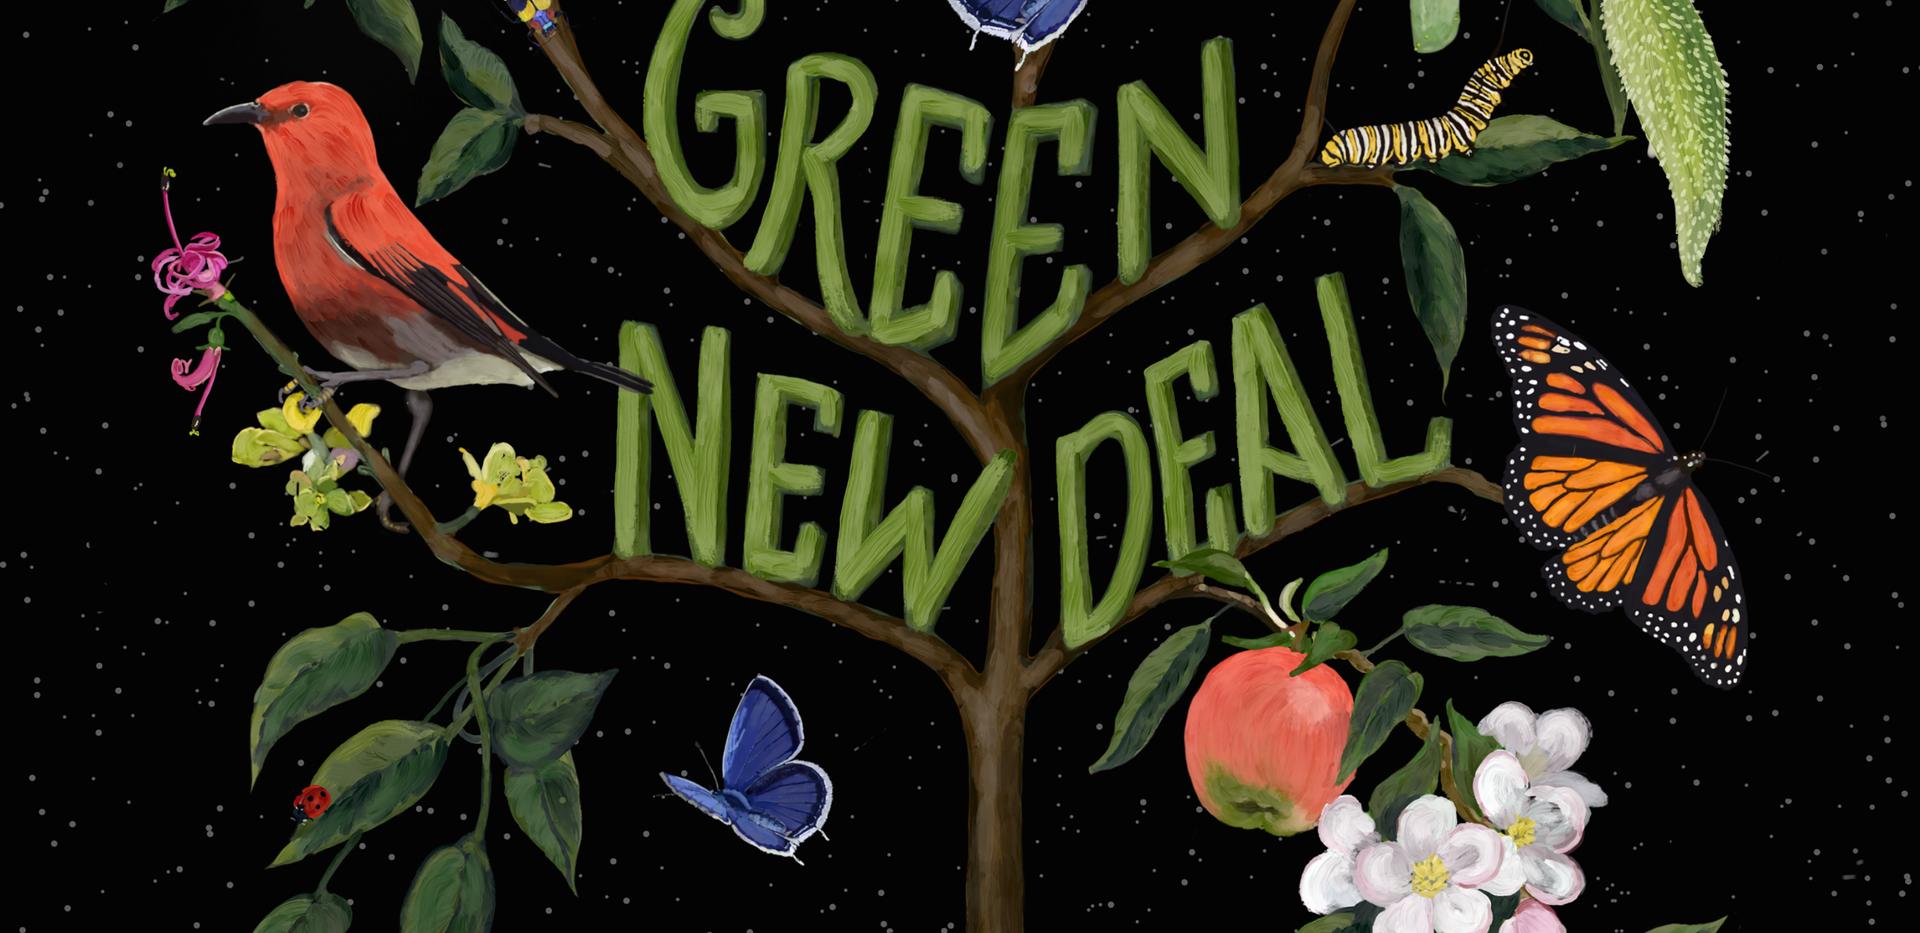 GREEN NEW DEAL - DARK